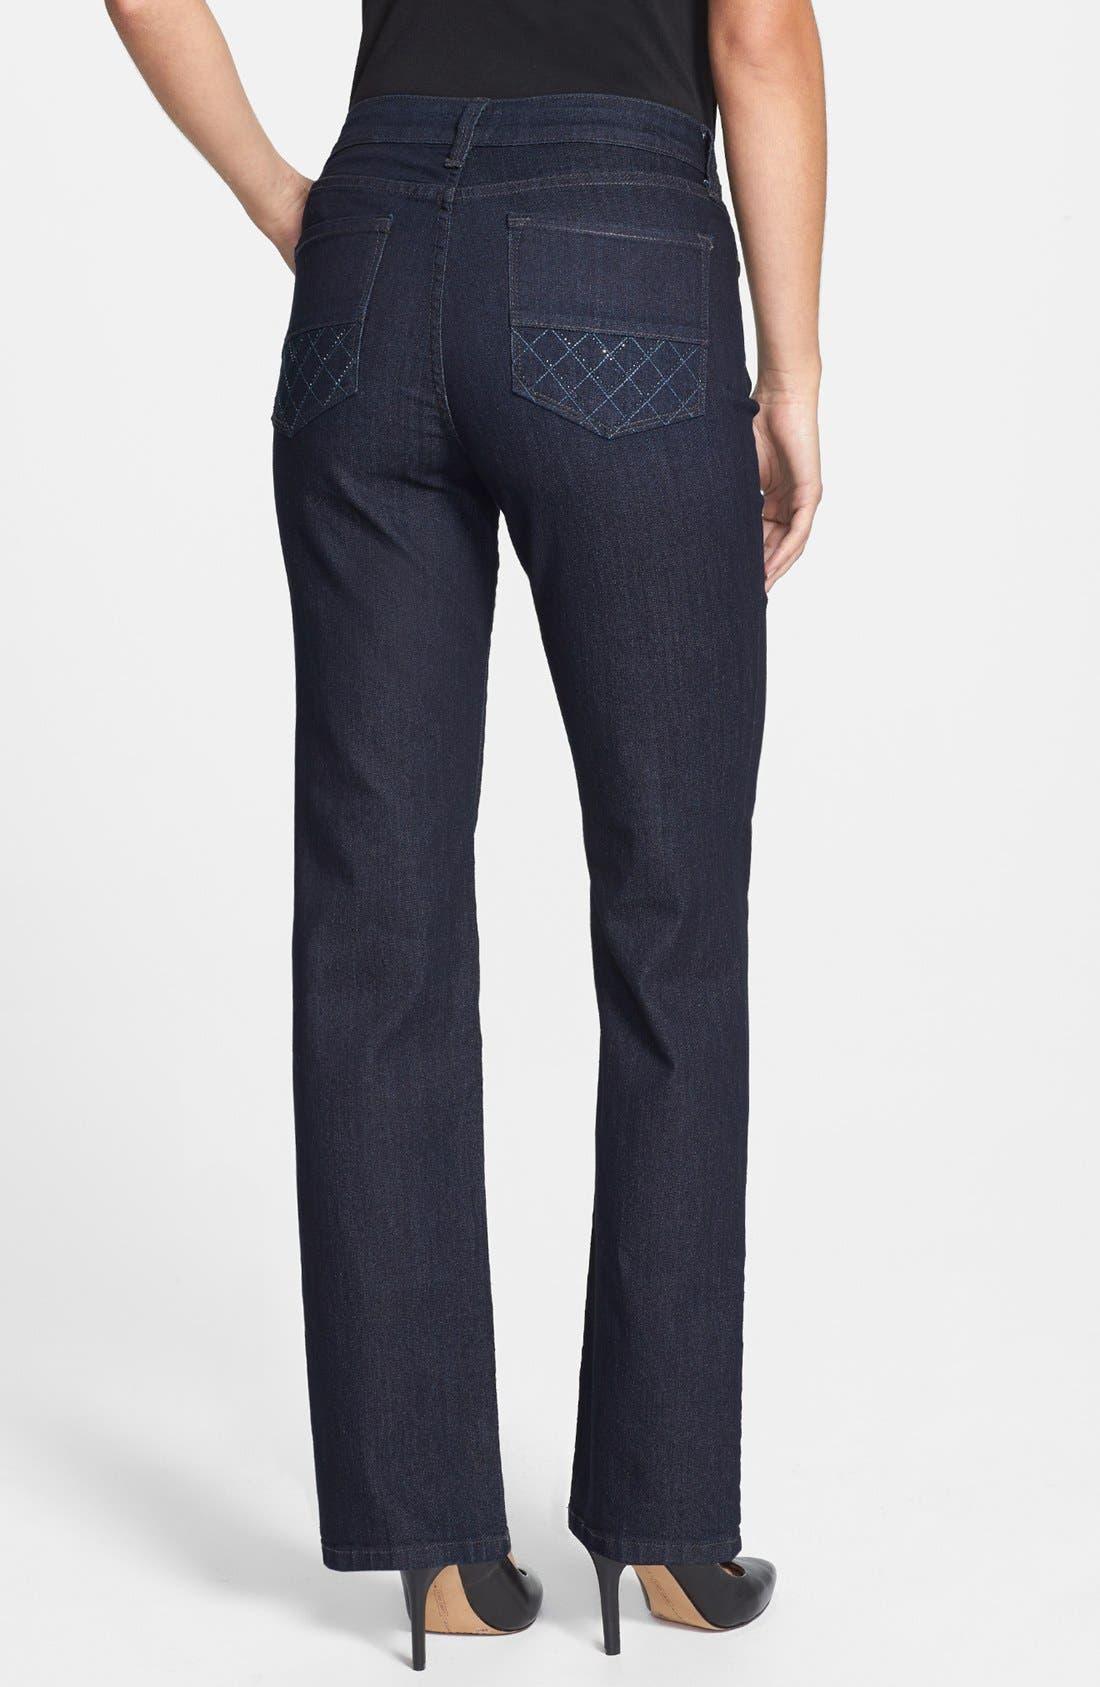 Alternate Image 2  - NYDJ 'Marilyn' Straight Leg Jeans (Dark Enzyme) (Petite)